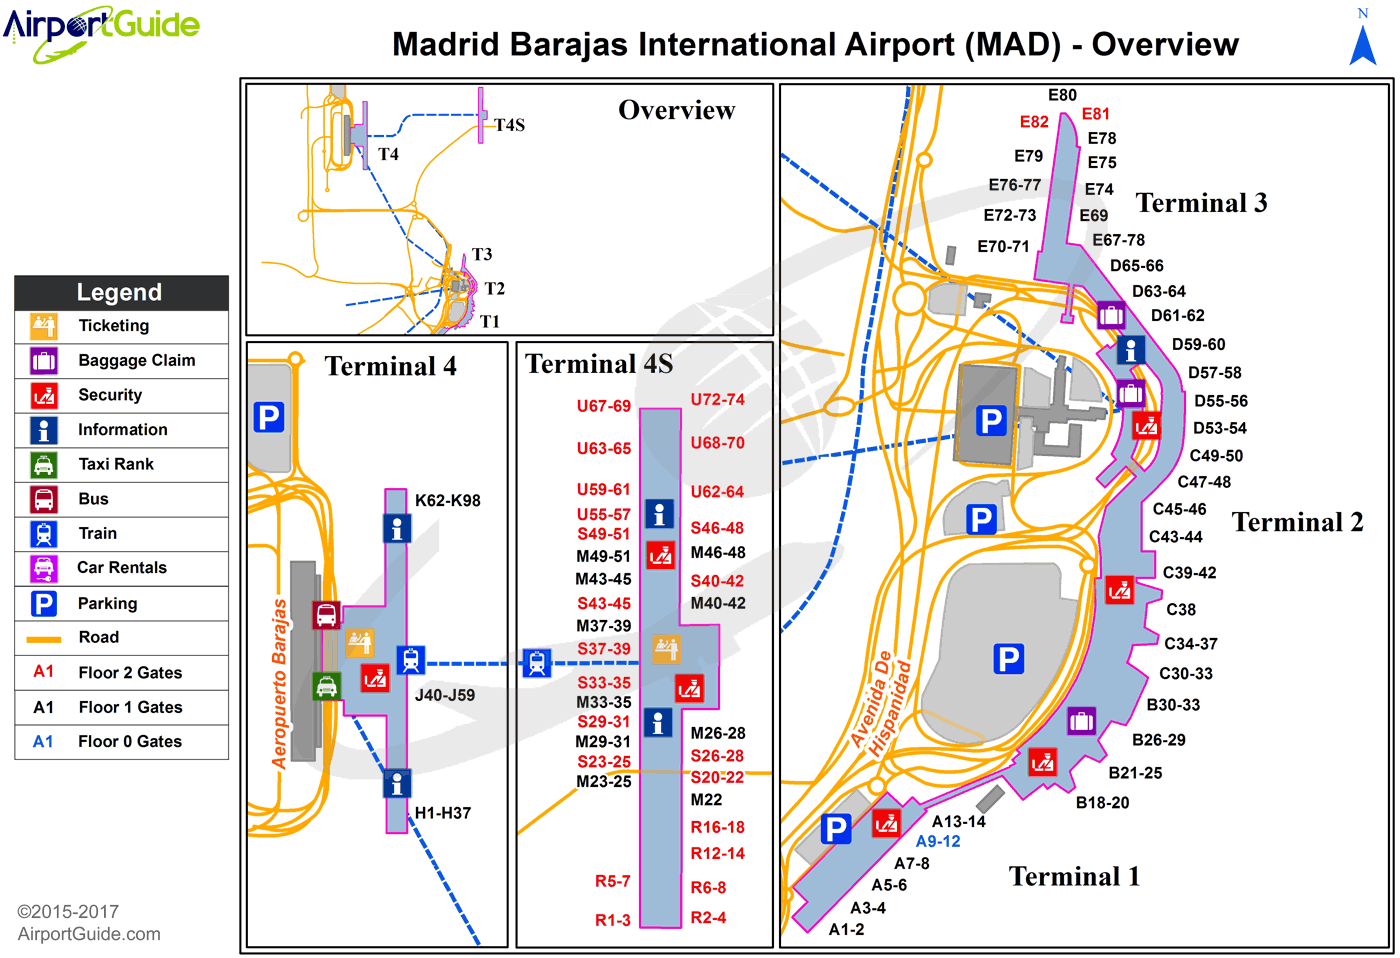 barajas airport terminal map Madrid Madrid Barajas International Mad Airport Terminal Map barajas airport terminal map